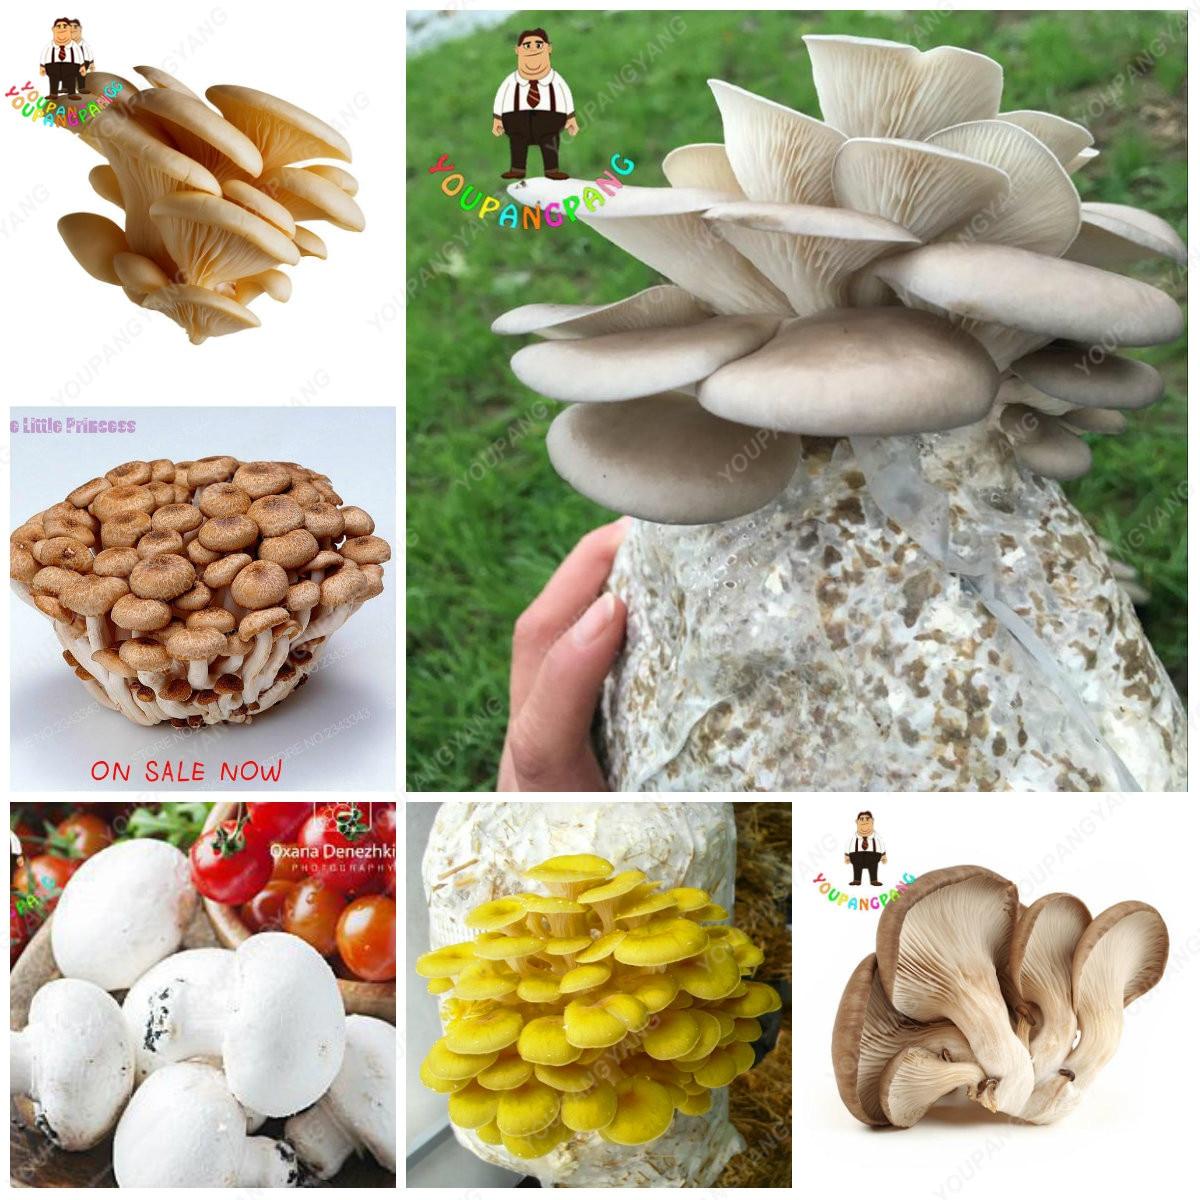 Hot Sale 100 Pcs A Variety Of Mixed Edible Mushrooms, Pleurotus Delicious Mushroom Strains Plants Bonsai Fruit Vegetables Garden